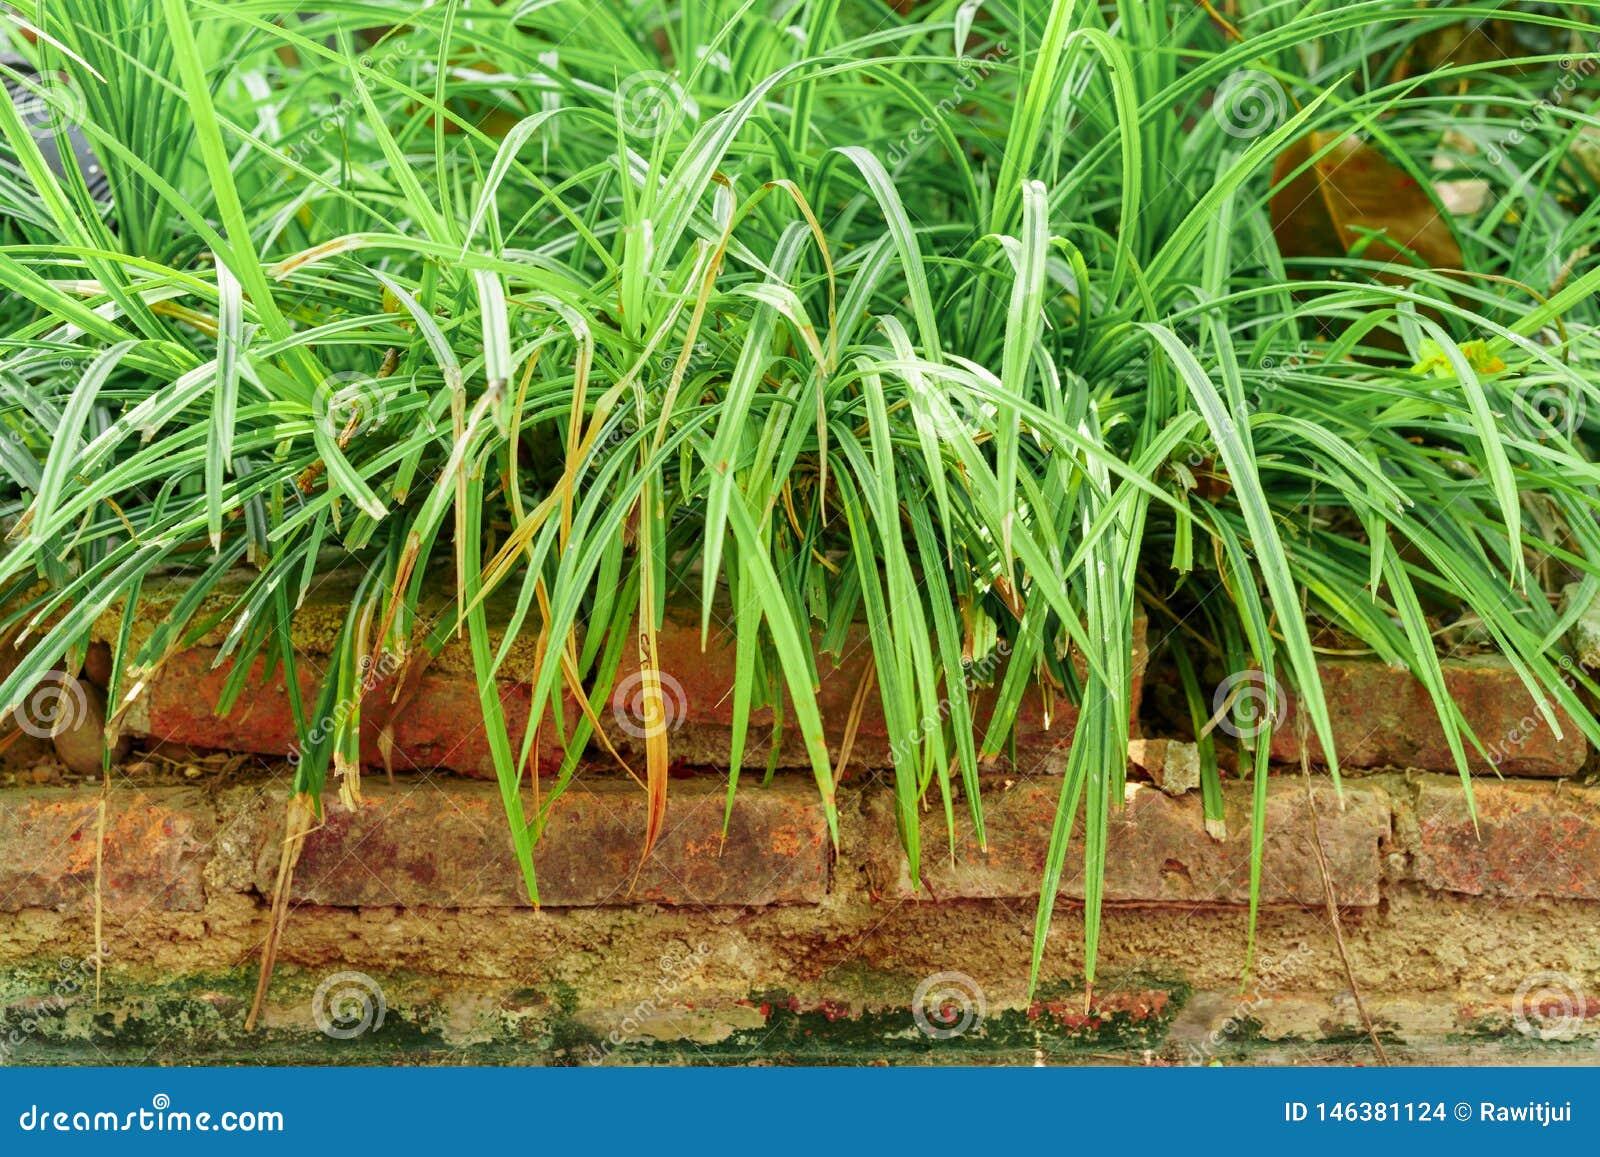 Long grass on the bricks